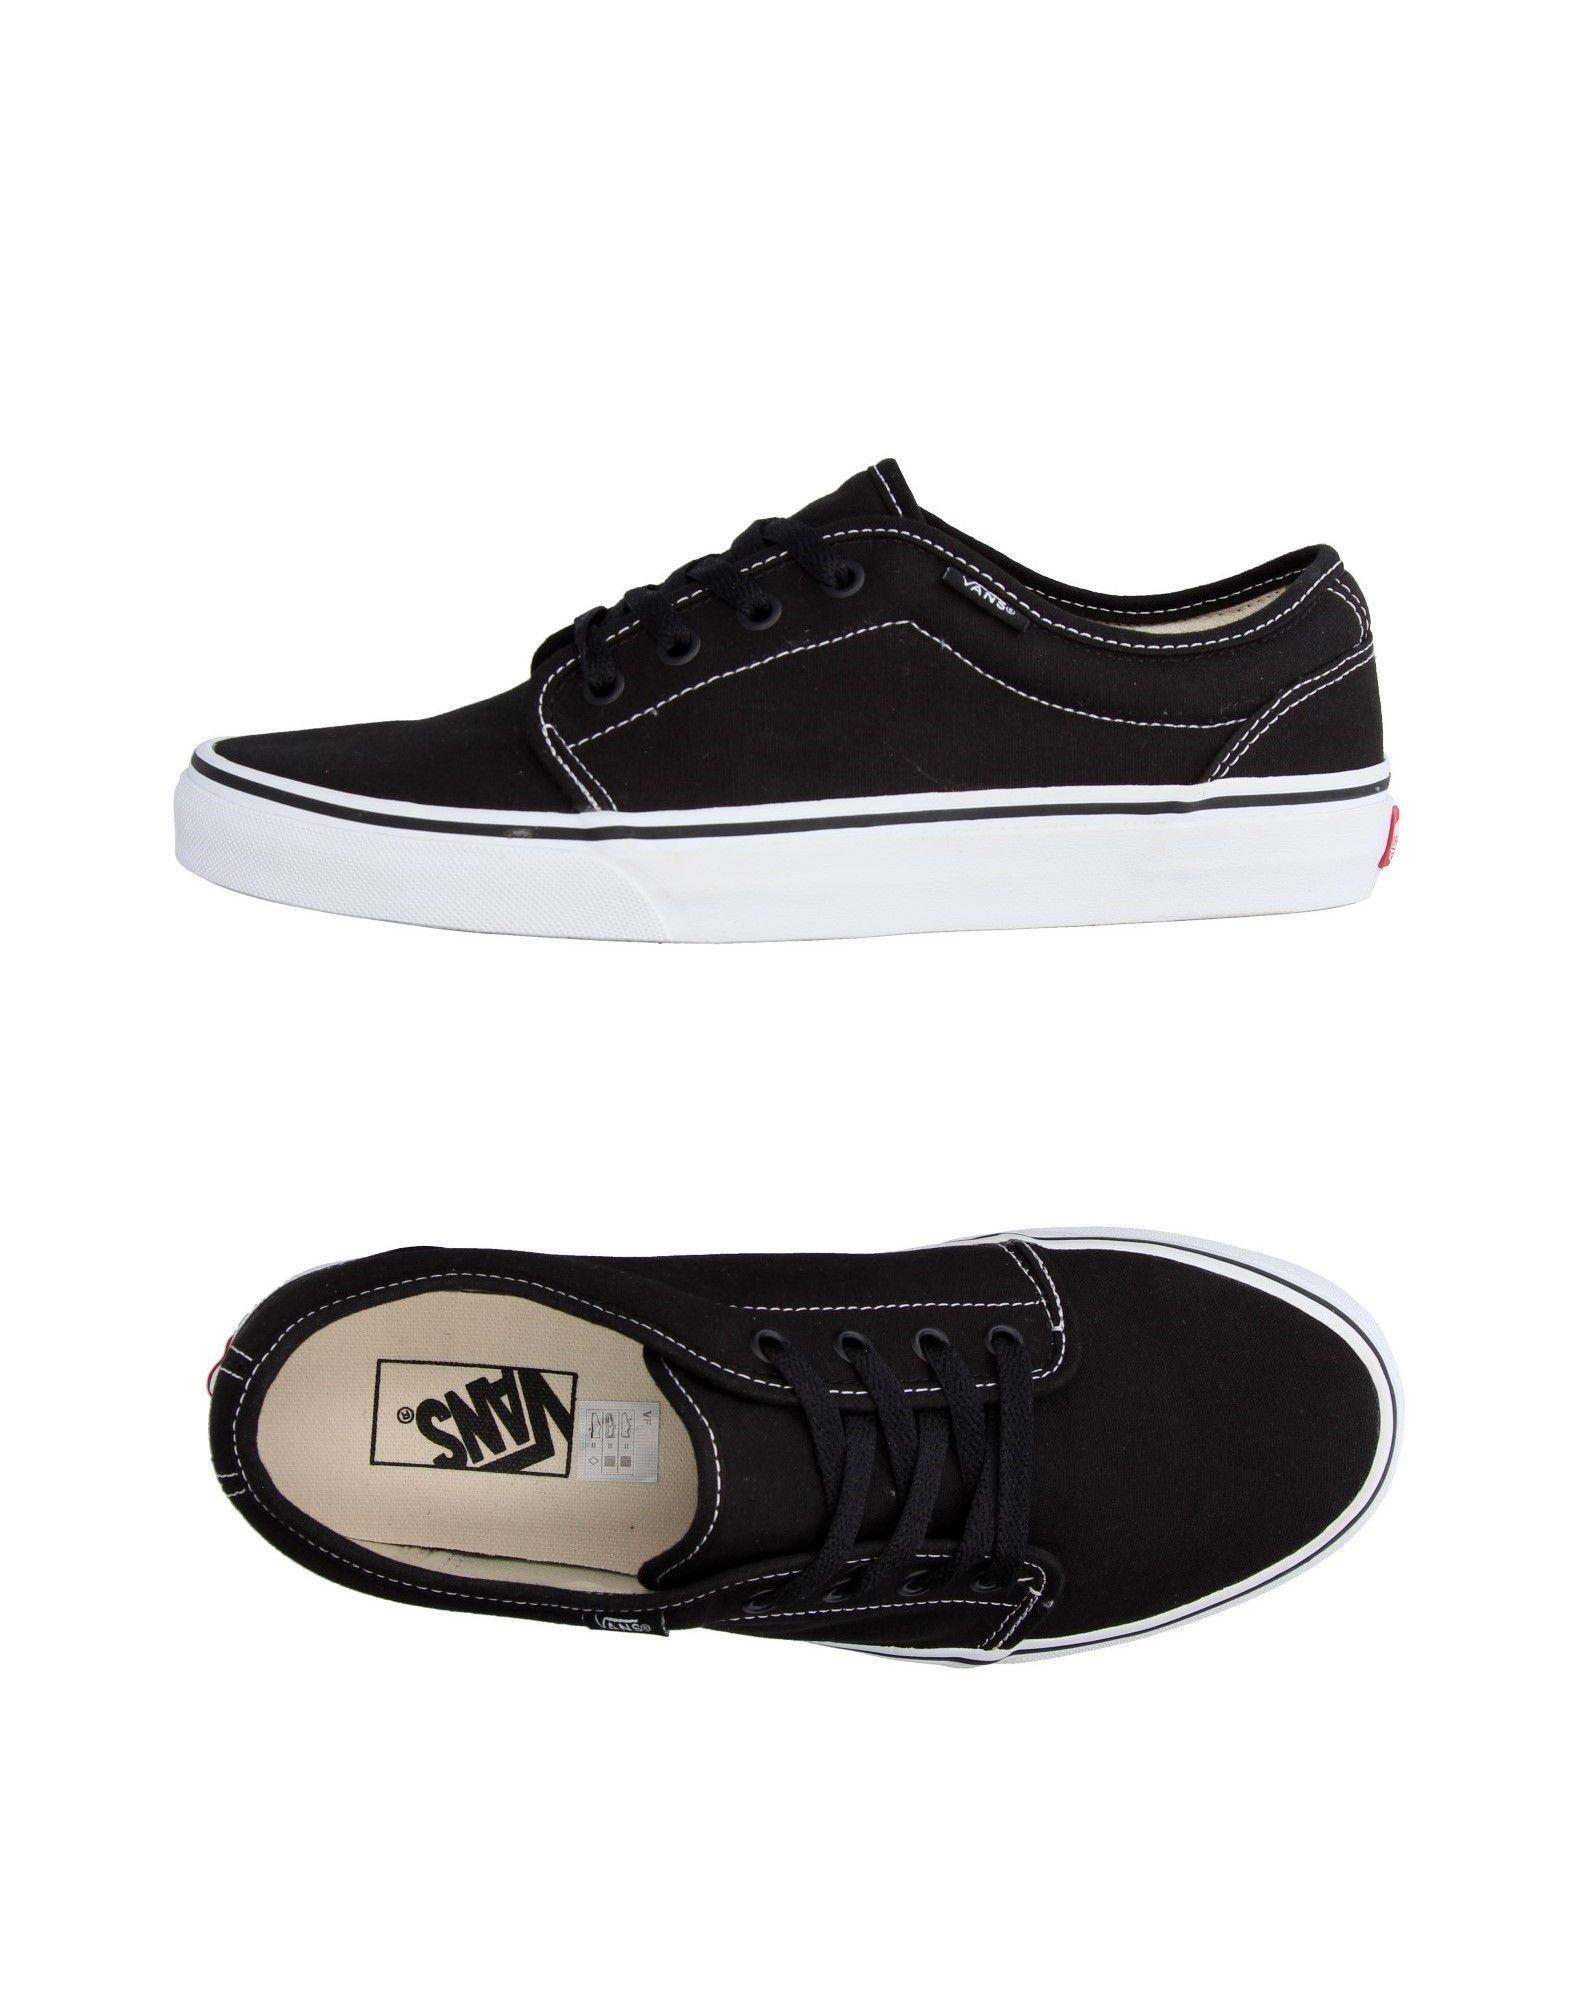 vans low tops sneakers in black for men lyst. Black Bedroom Furniture Sets. Home Design Ideas